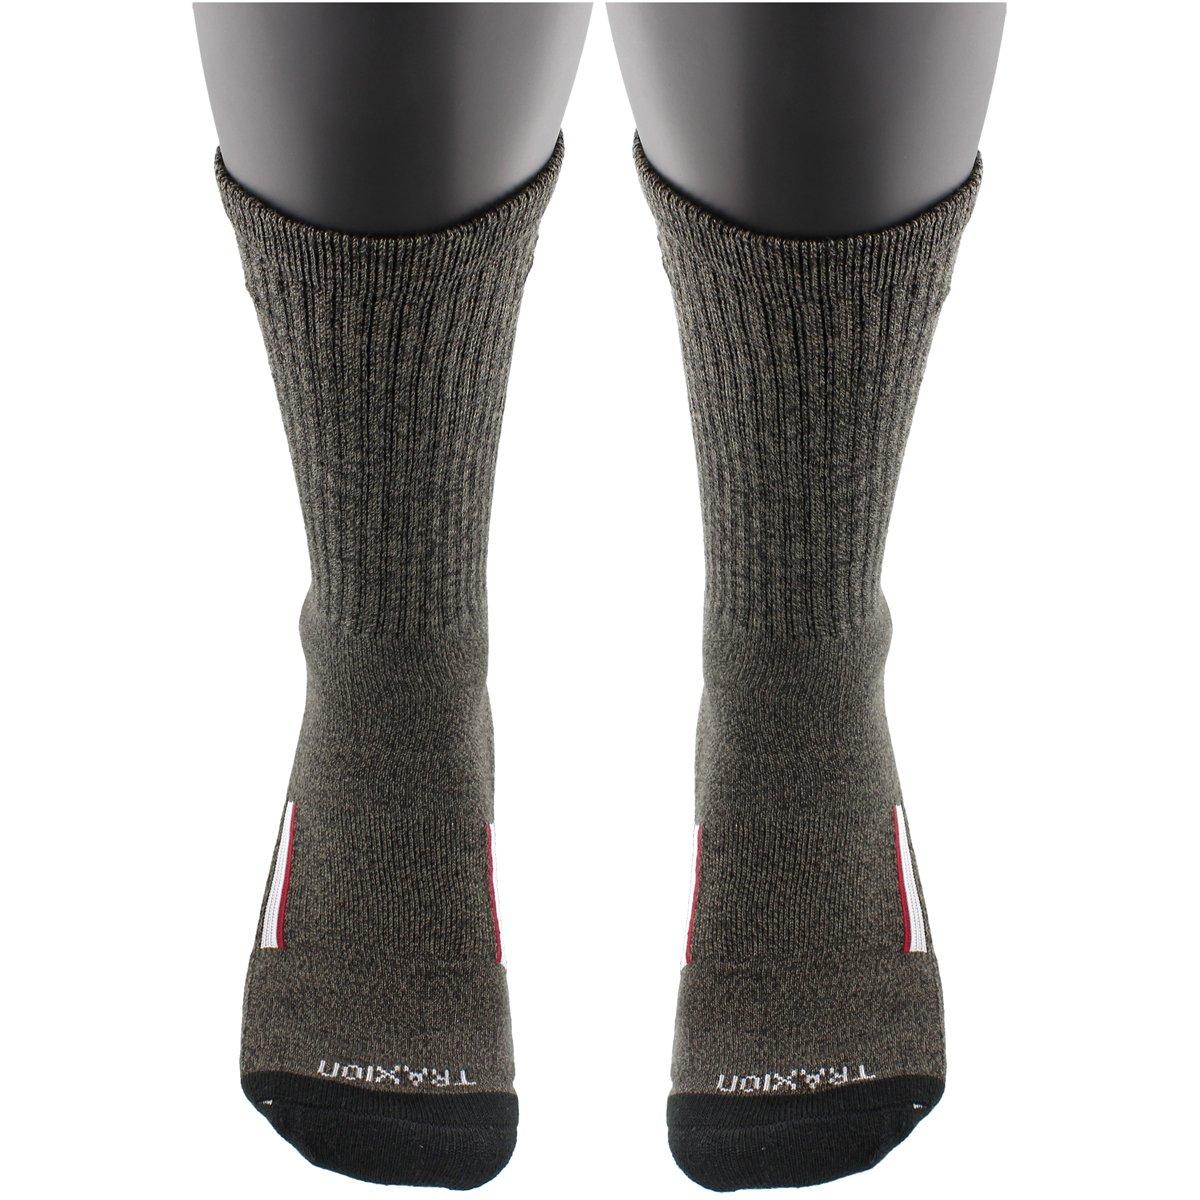 fa3ac8ac74 Amazon.com: adidas Men's Climalite X II Crew Socks (2-Pack), Black Graphite  Marl/Black/Light Onix/Collegiate Burgundy, Large: Sports & Outdoors